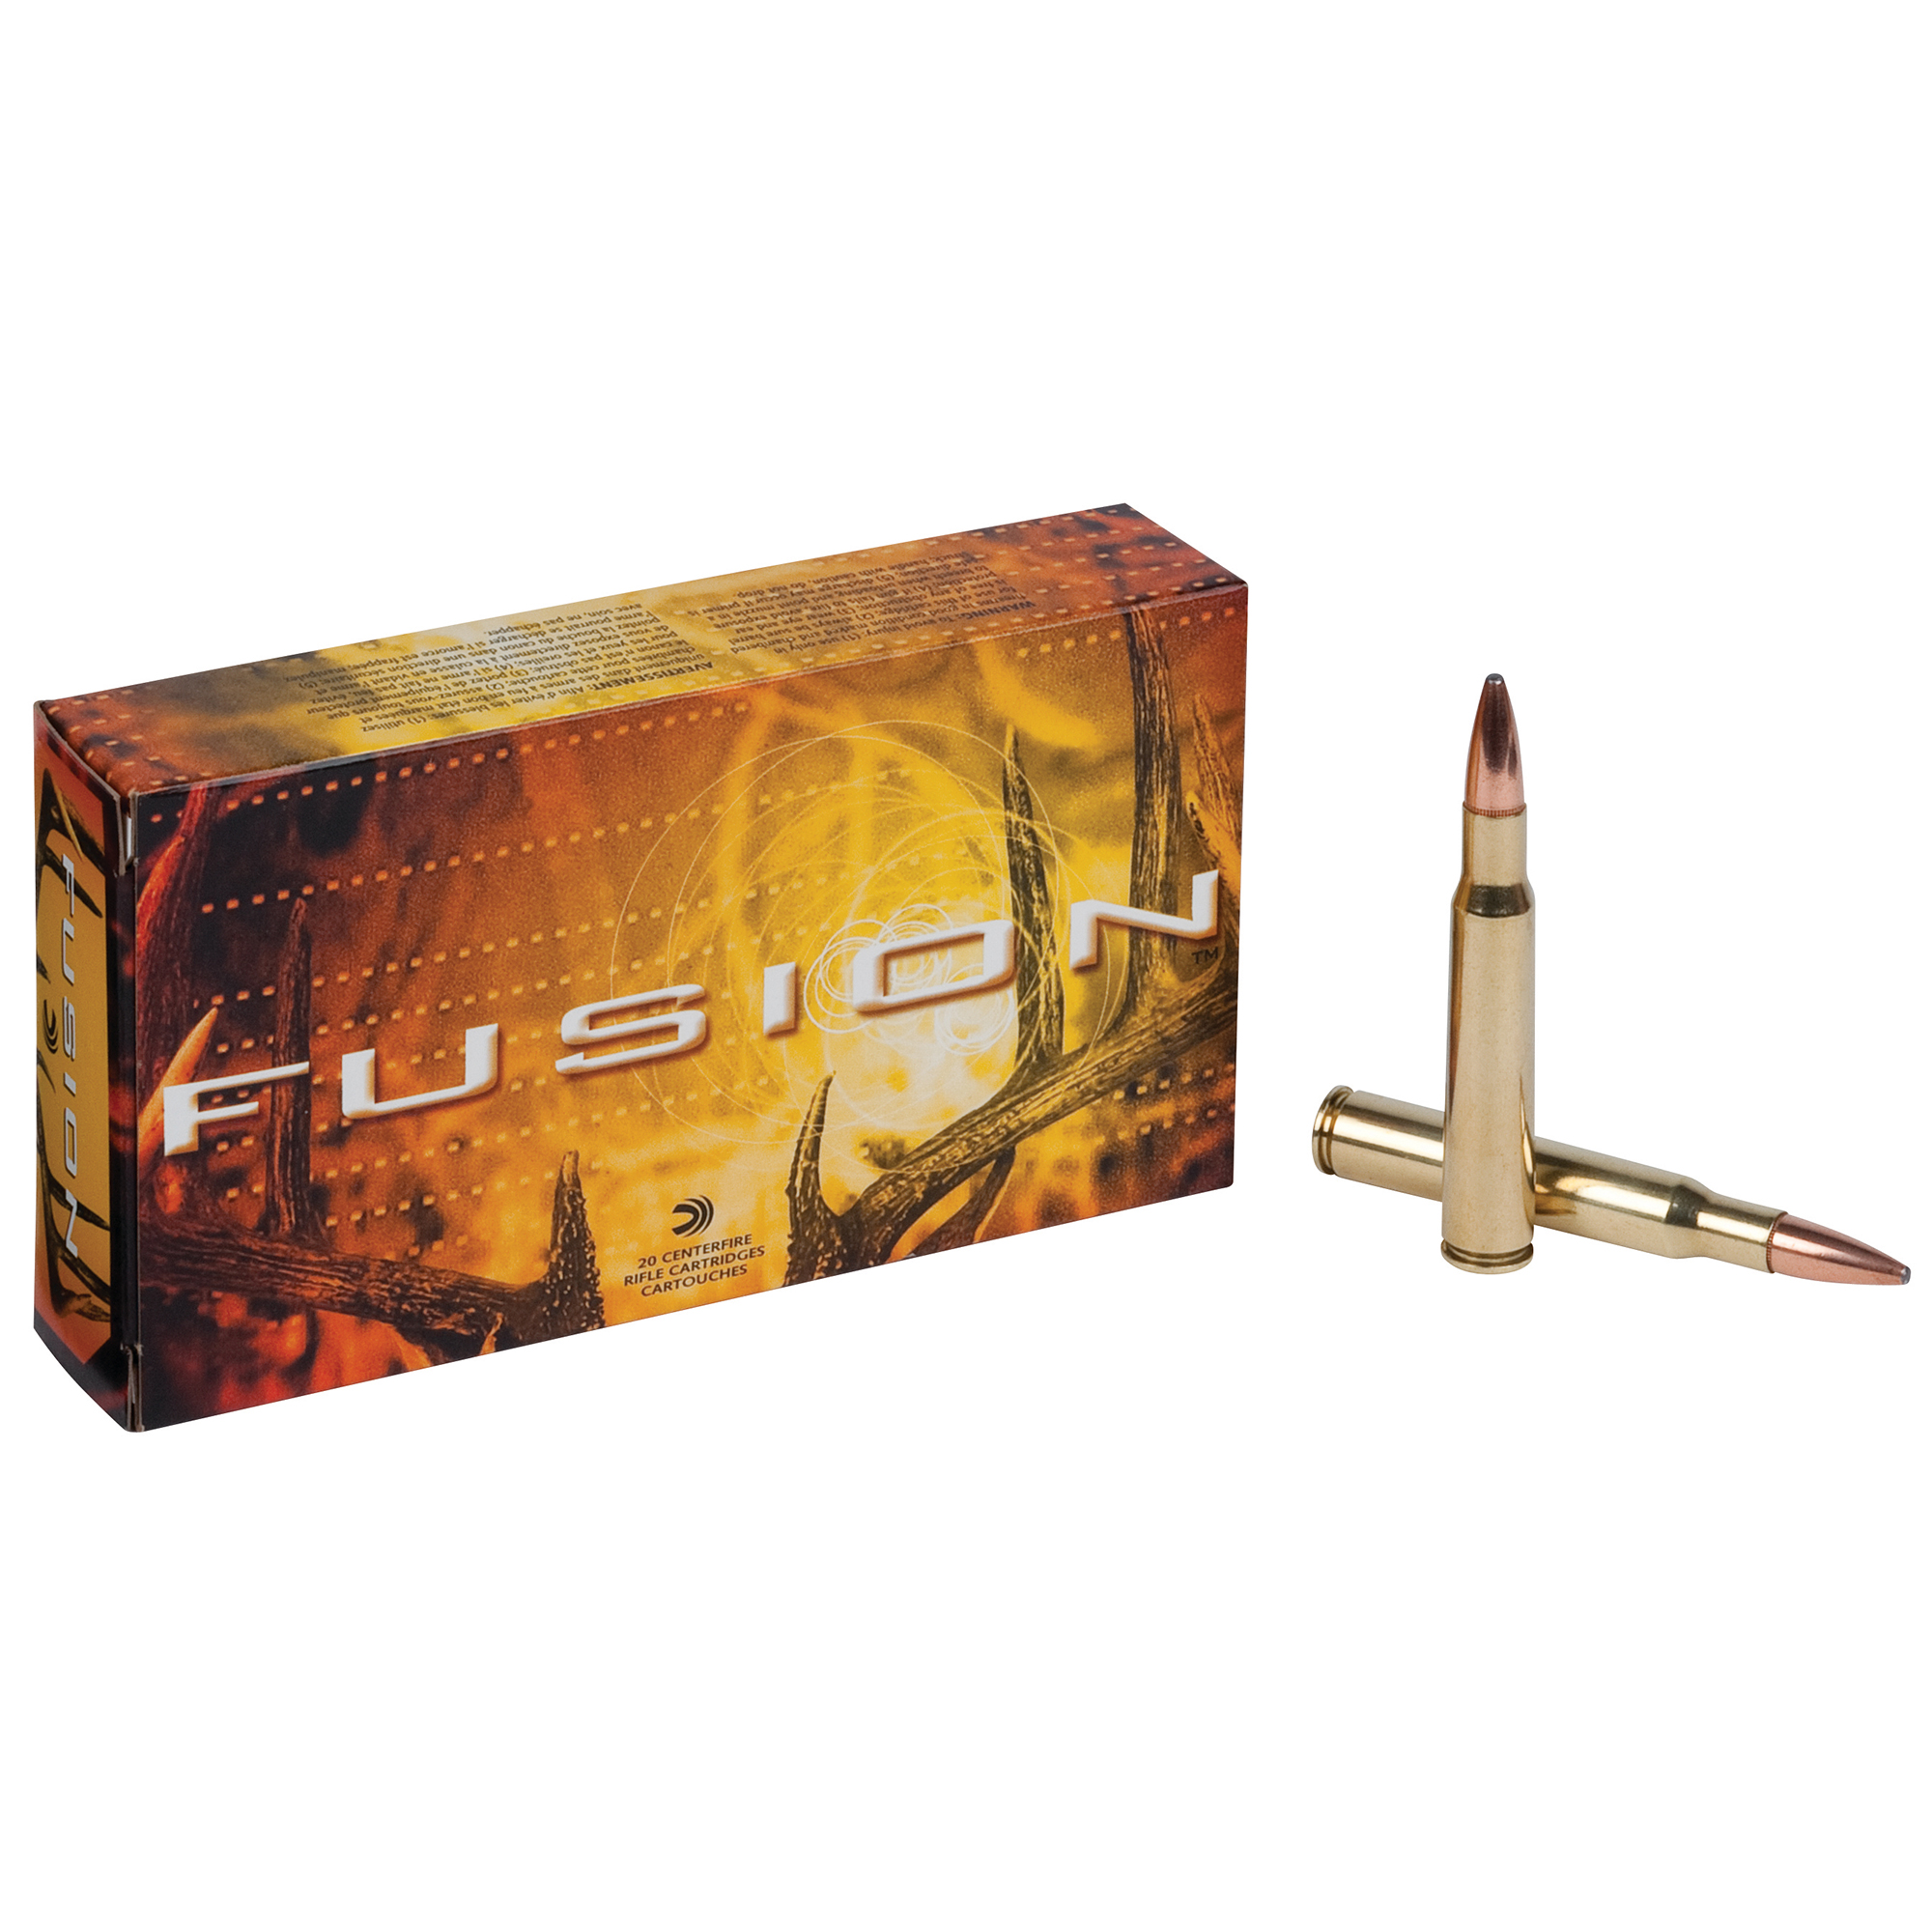 Fusion Rifle Ammunition, .243 Win, 95-gr, BTSP